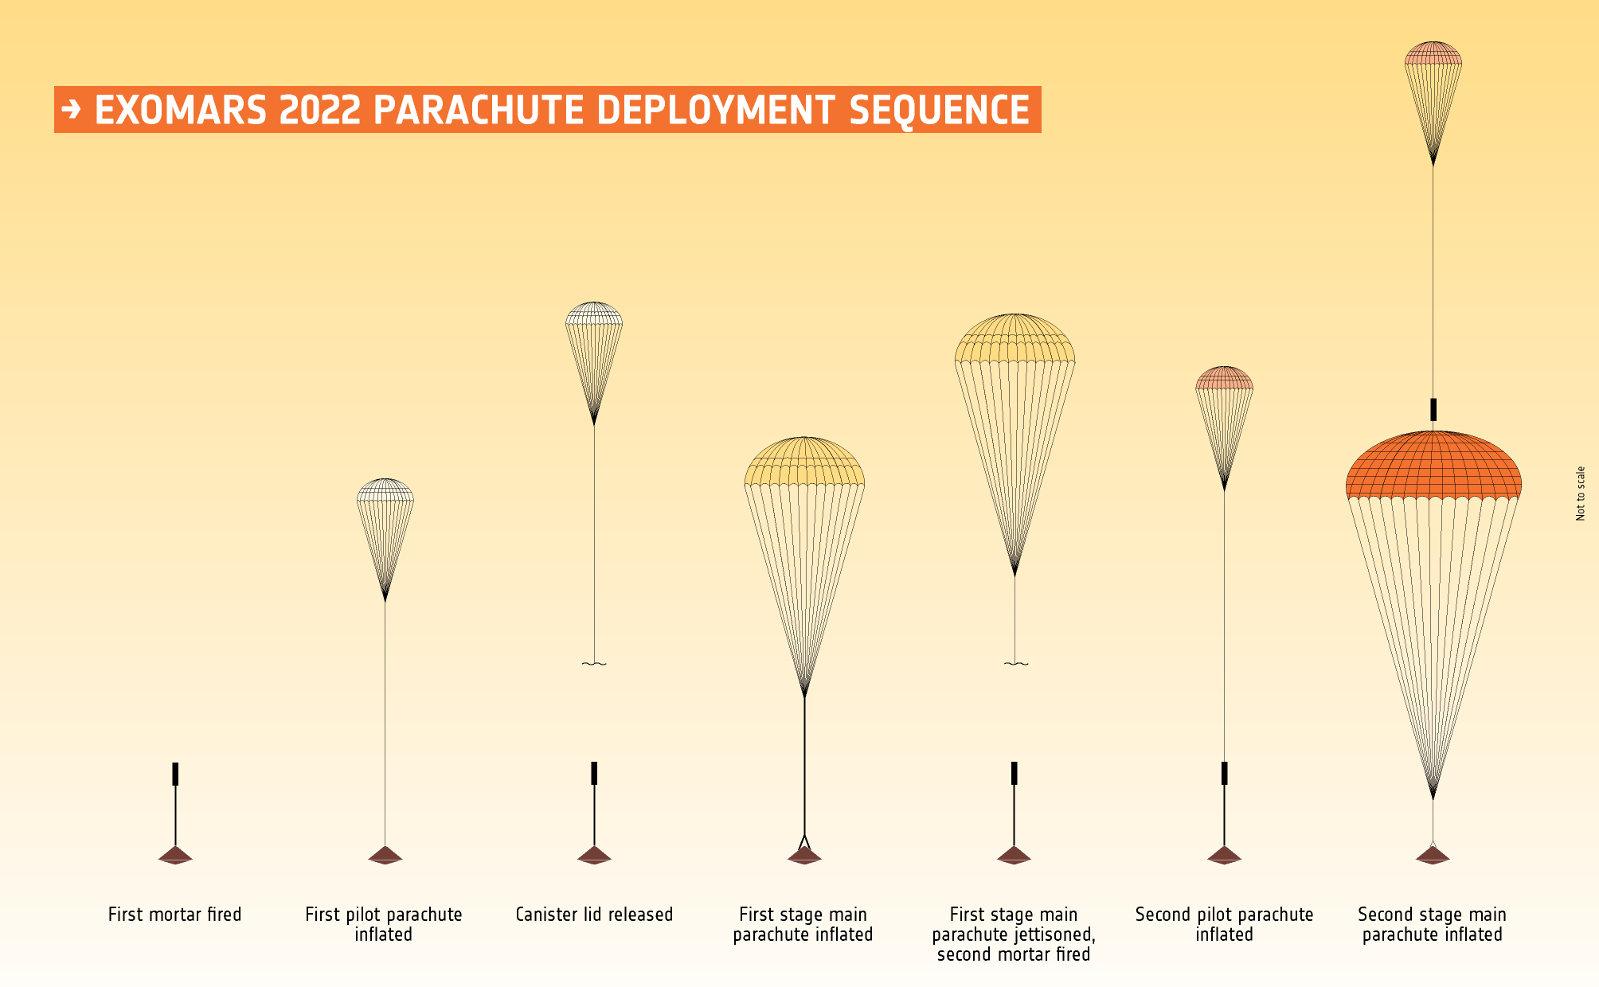 ExoMars parachute deployment sequence